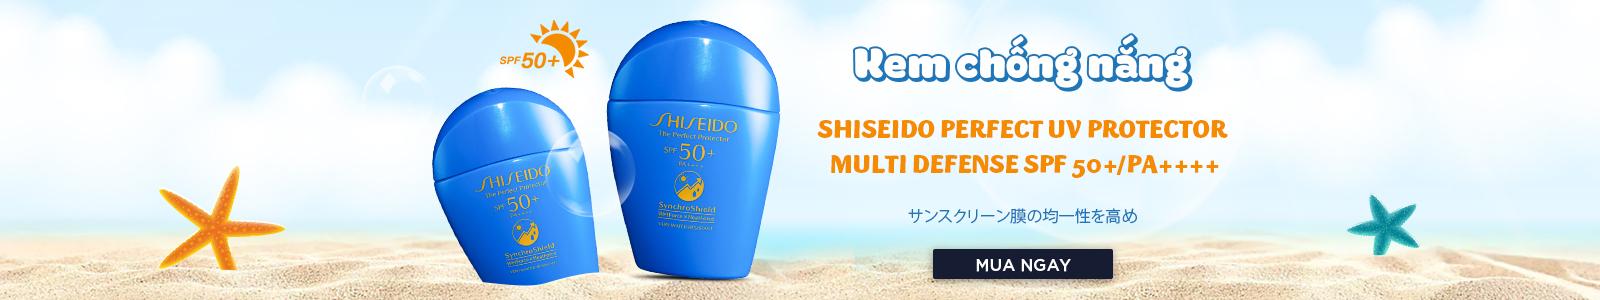 Kem chống nắng Shiseido Perfect UV Protector Multi Defense